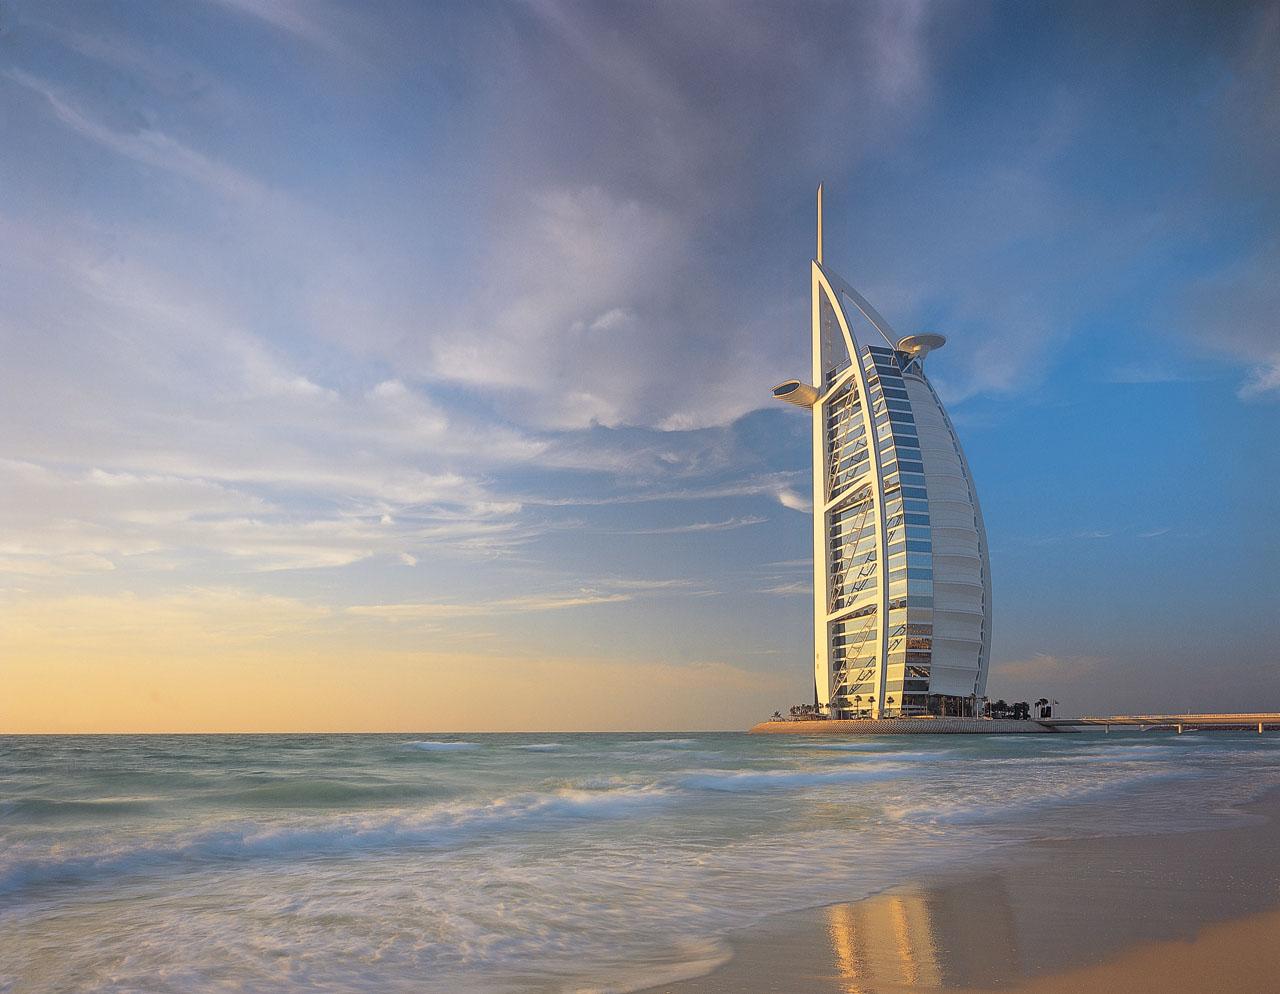 World most popular places burj al arab dubai for Burj al arab 7 star